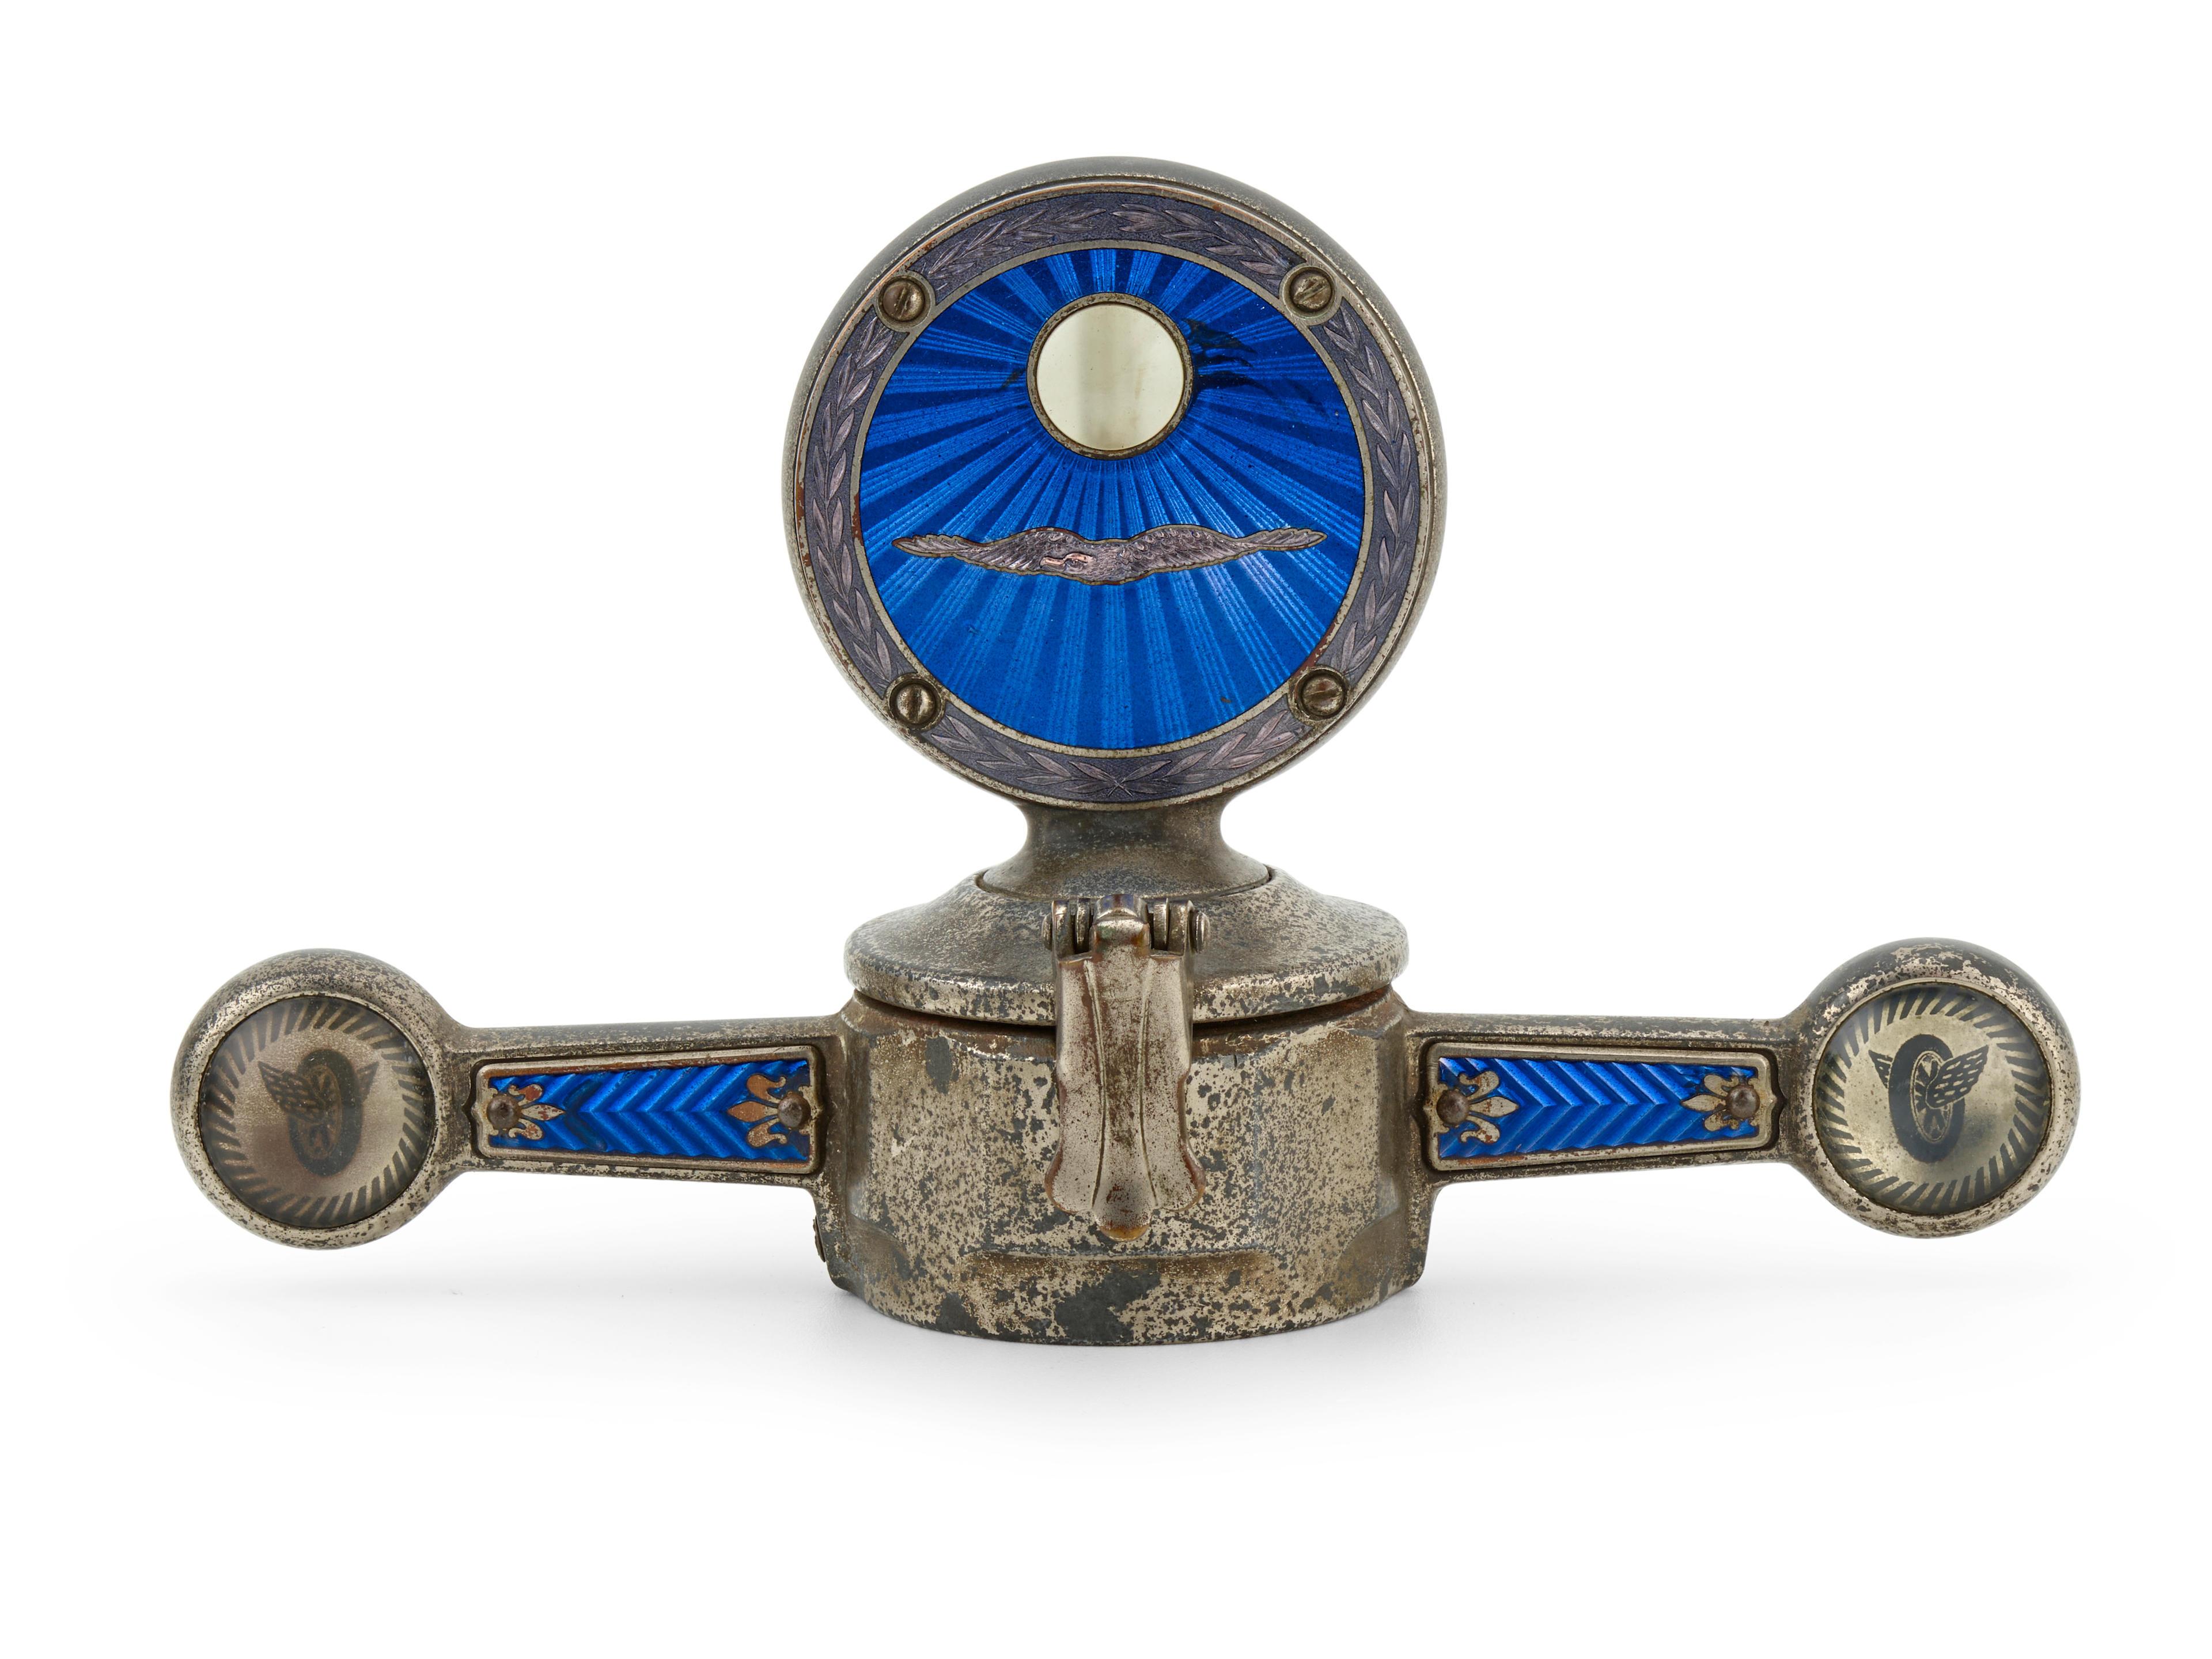 A cloisonné enameled decorative motor meter, American, 1920s,